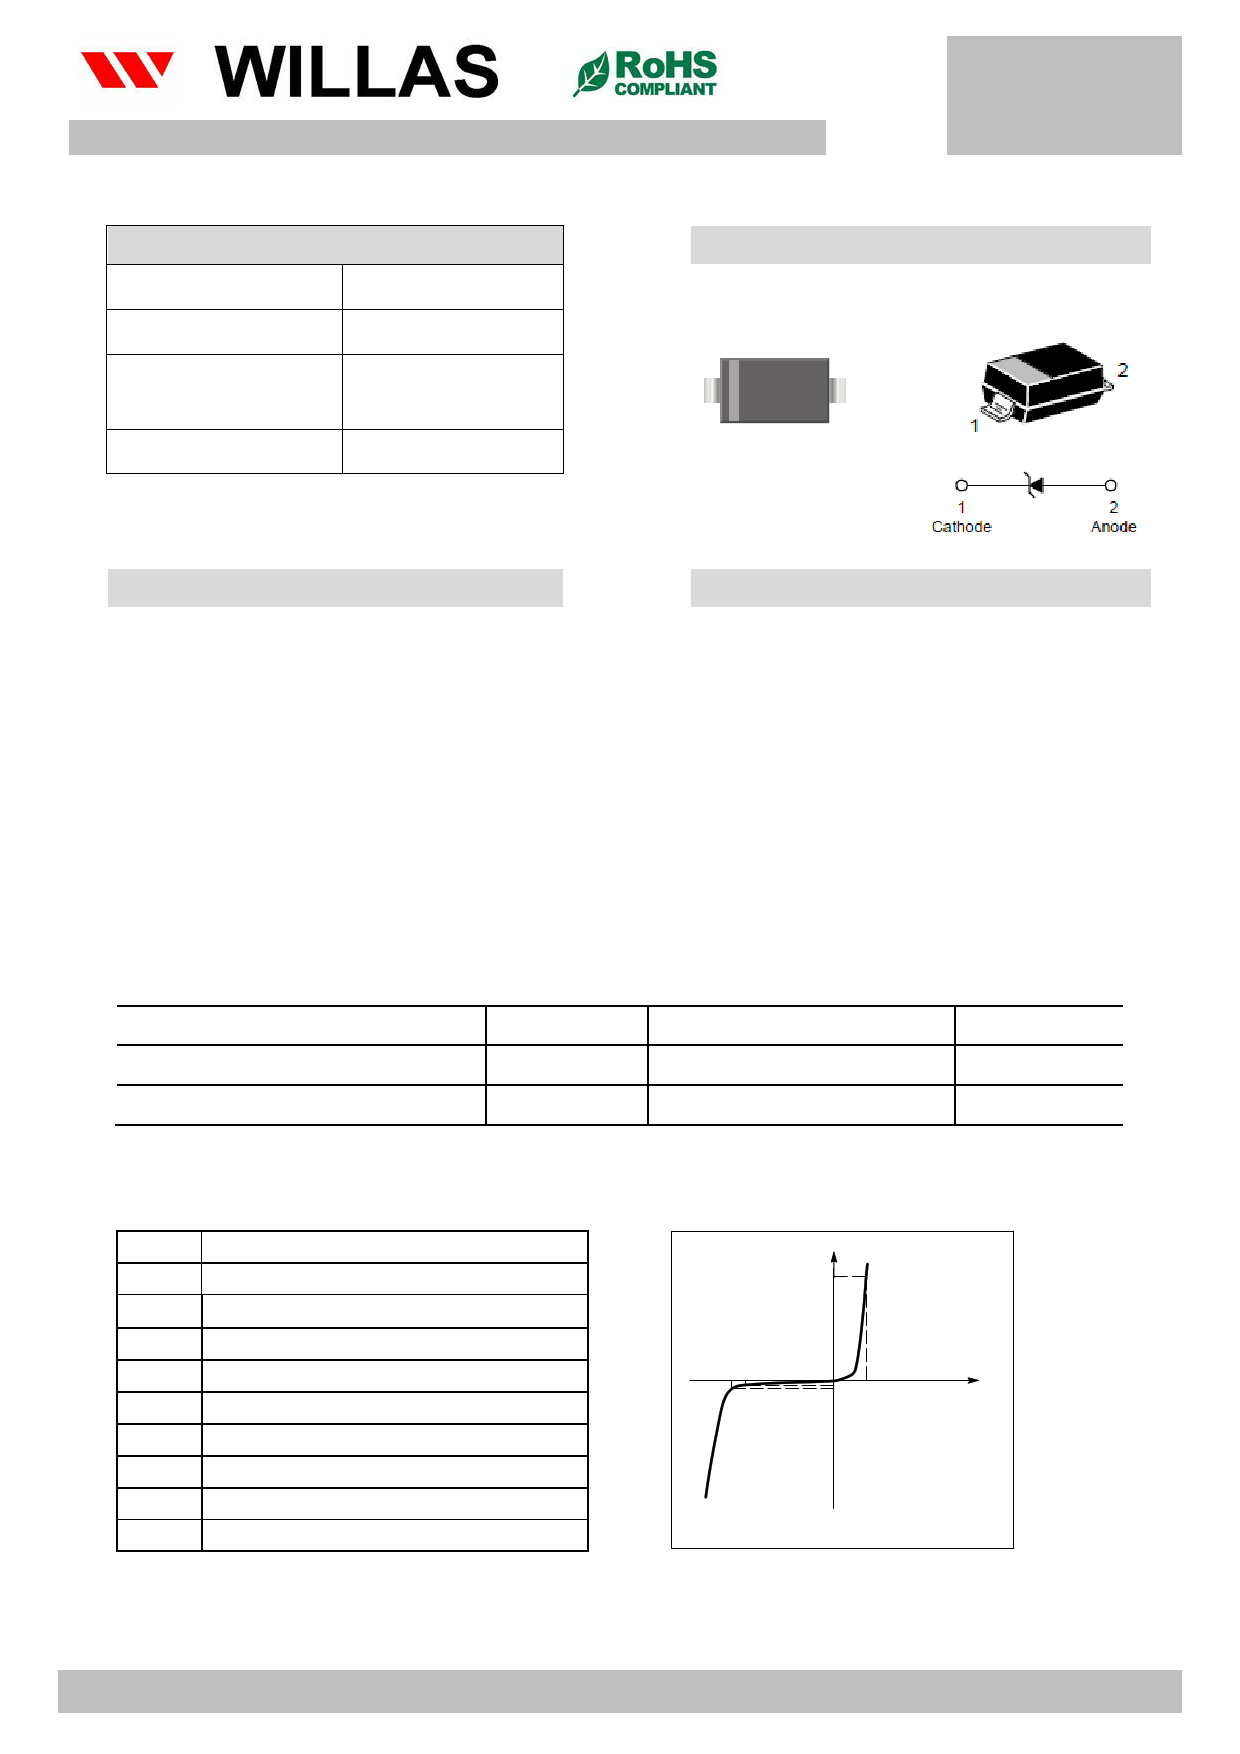 MMSZ5228B Datasheet